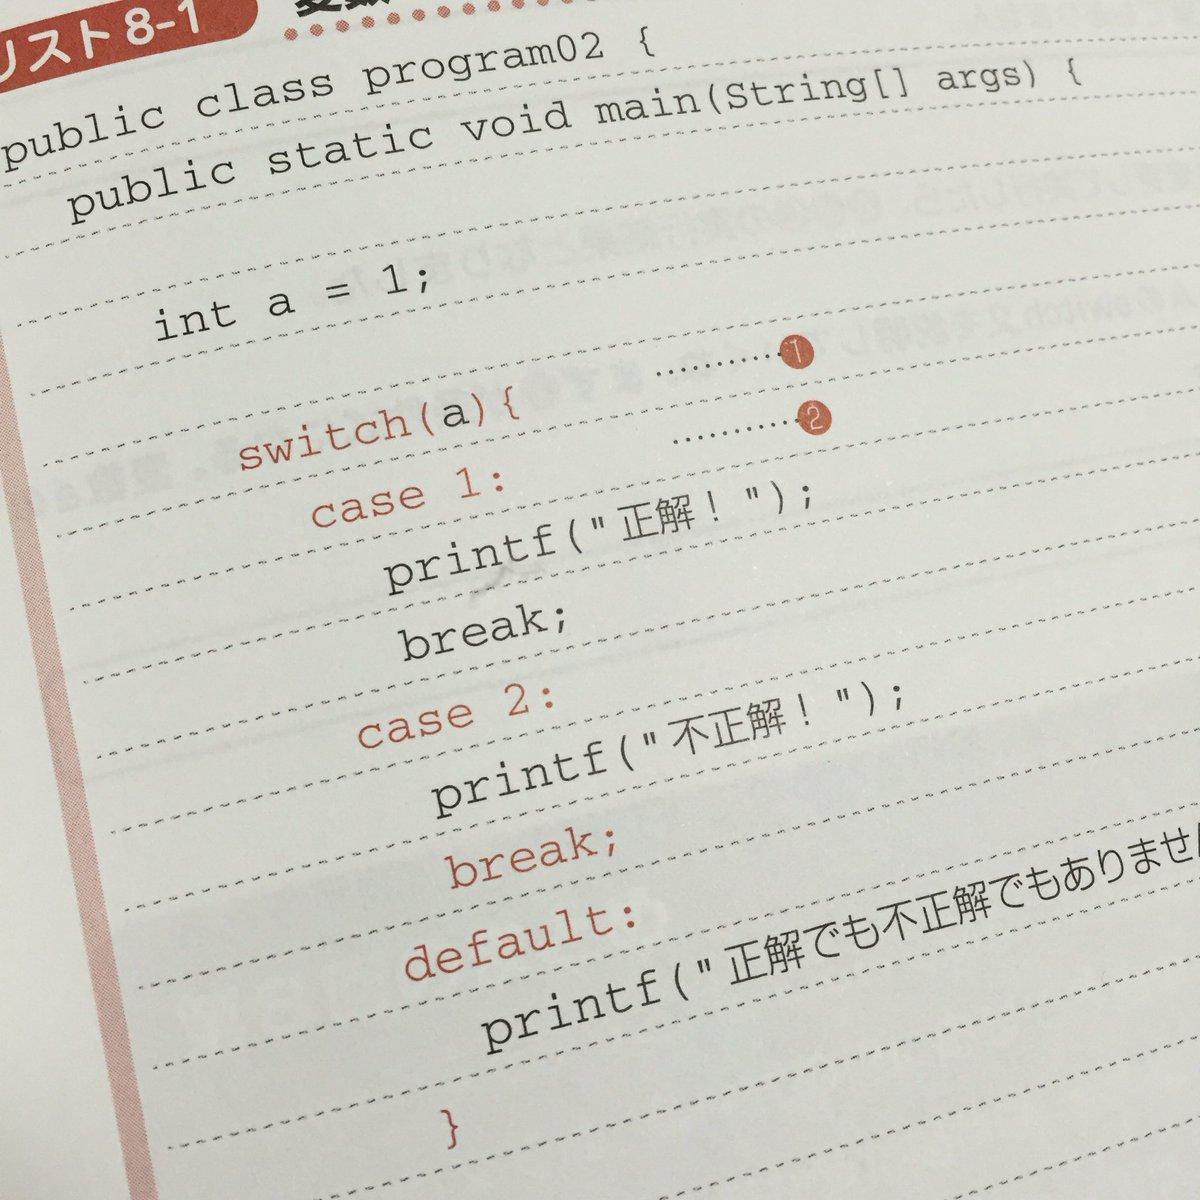 Java入門書に取り組んでる娘氏。「あのさ、また動かないんだけど?」printf()って何だよwww誤植かもね、とか擁護できるレベルじゃねえwww他所からソースコードをパクってくるとかwwwサイテーだなこの本wwwwwwwww pic.twitter.com/bMqin2K43e